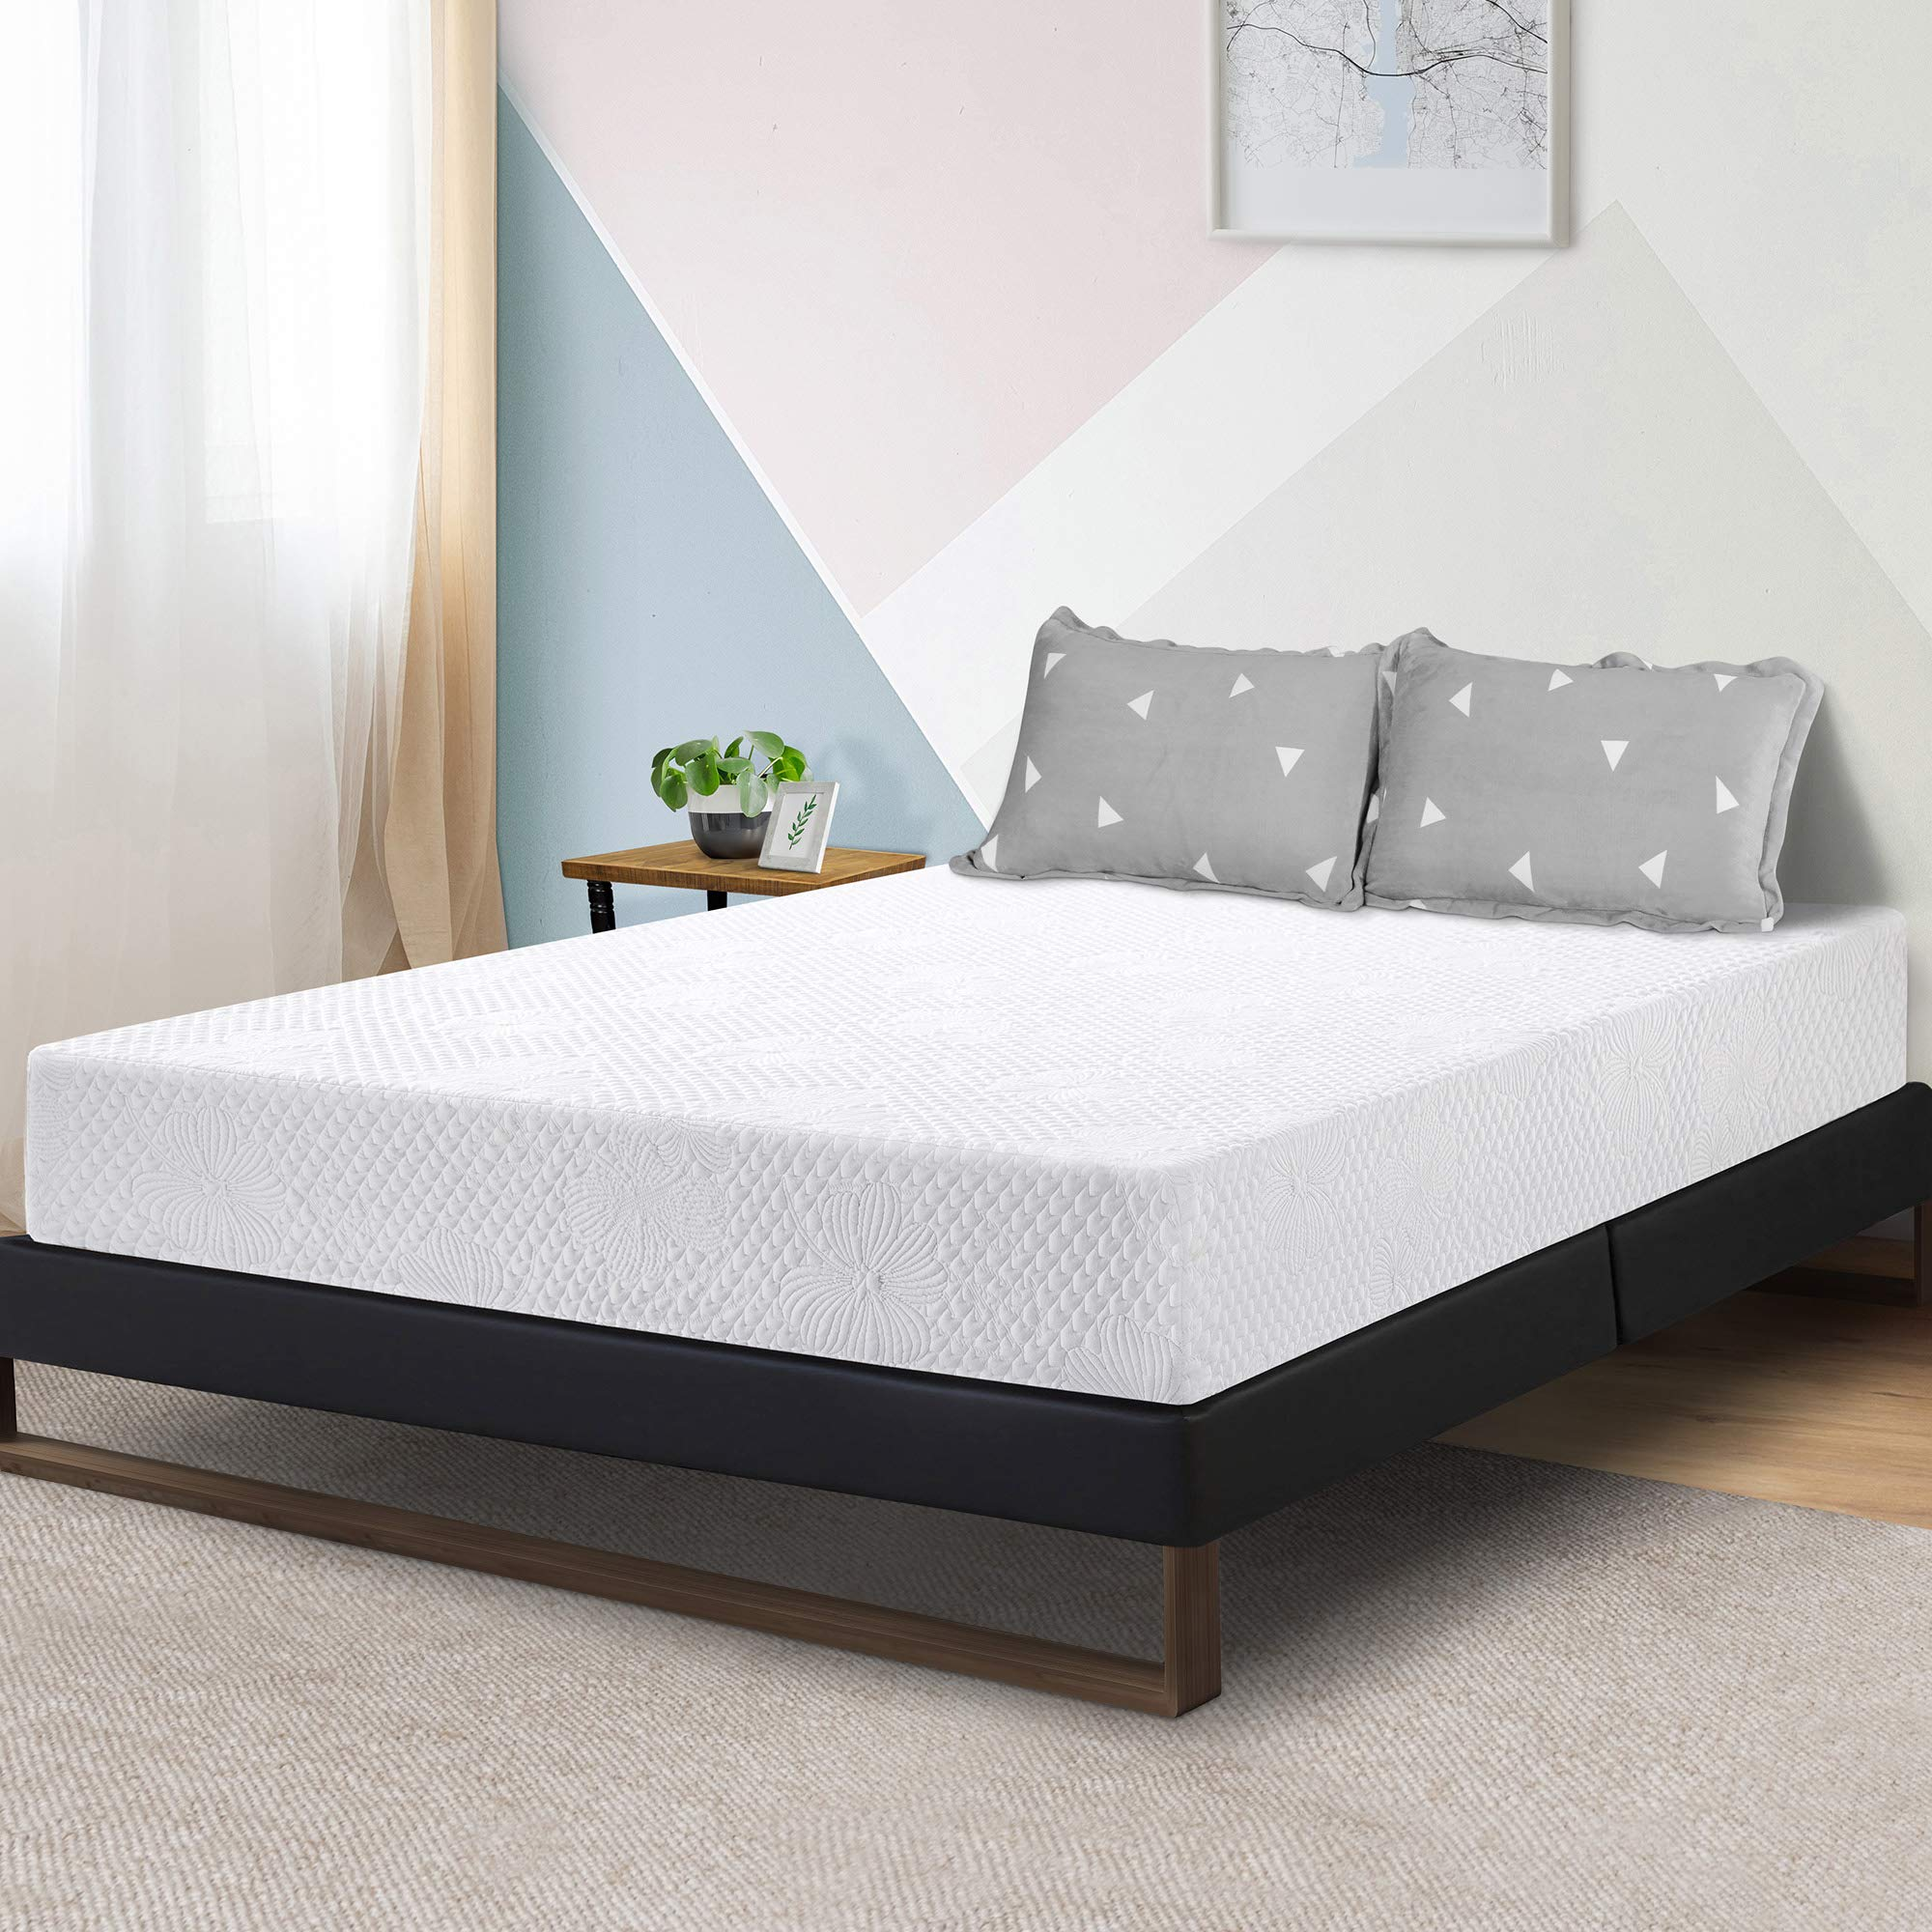 Olee Sleep 8-Inch Firm Ventilated Convolution Queen Memory Foam Mattress by Olee Sleep